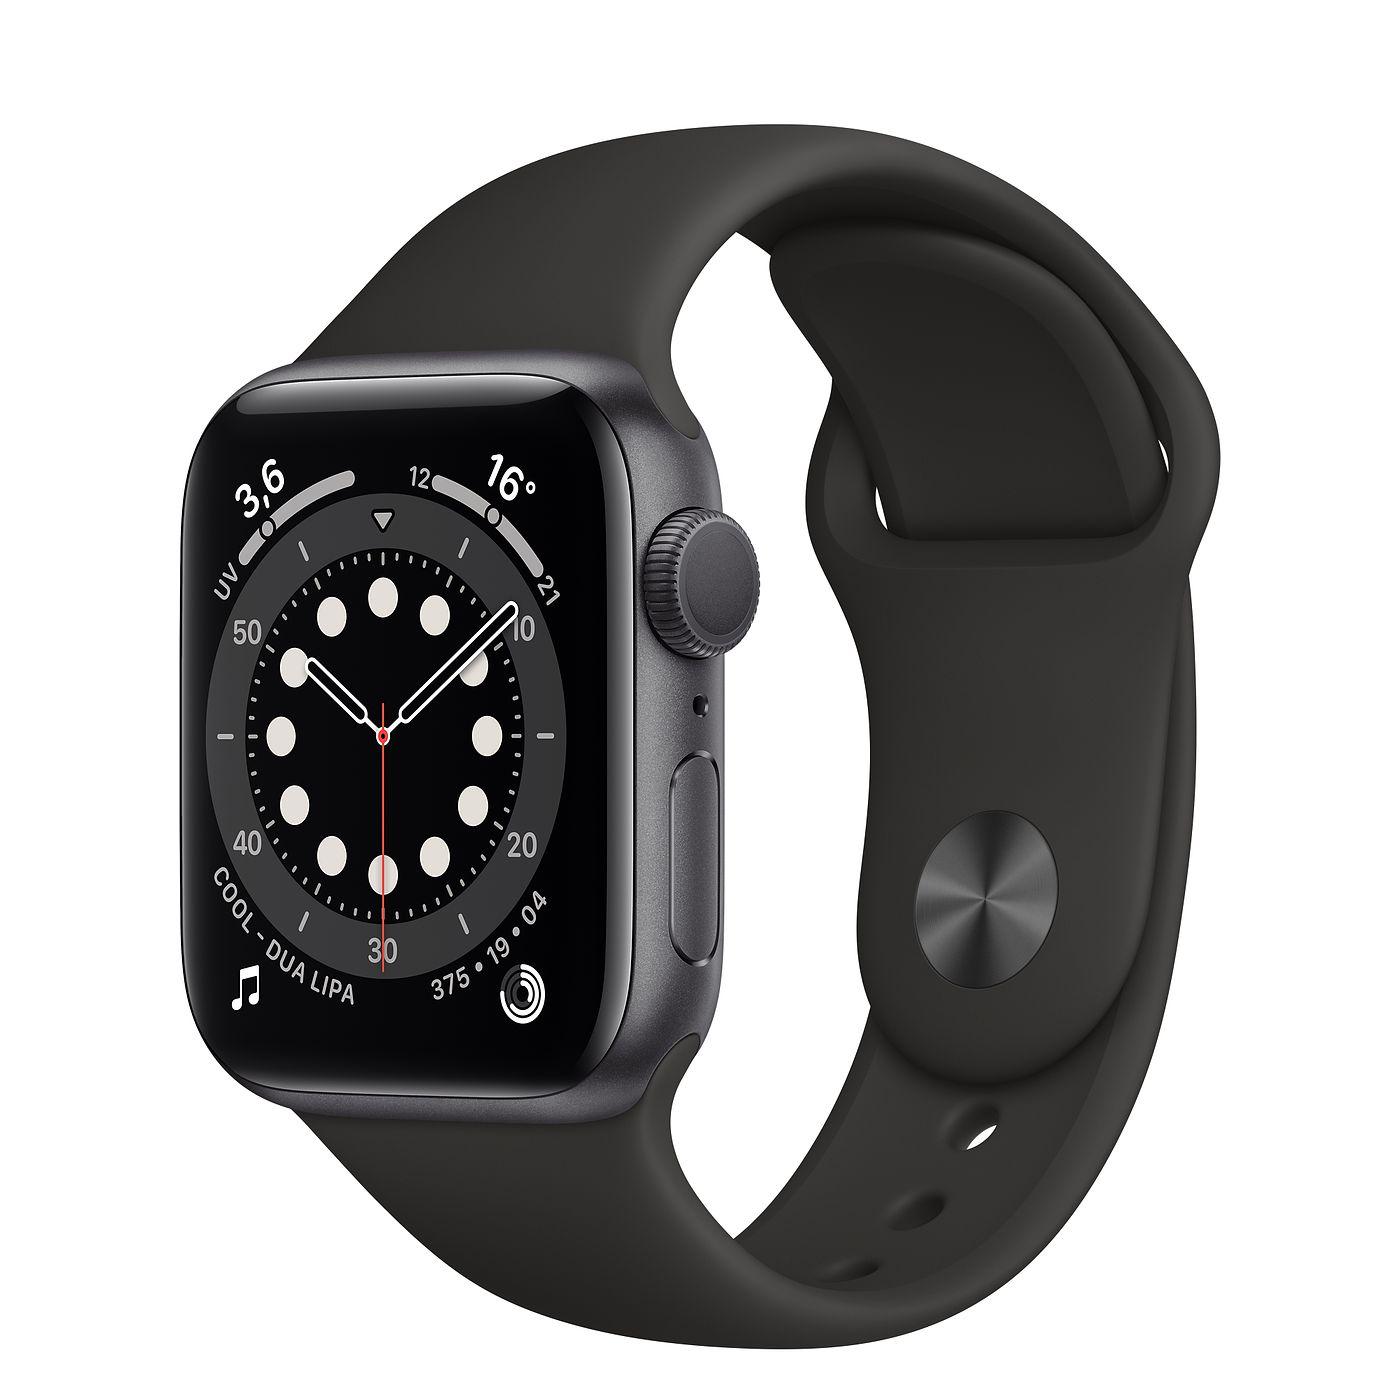 MTP62_VW_34FR+watch-40-alum-spacegray-nc-6s_VW_34FR_WF_CO_GEO_FR